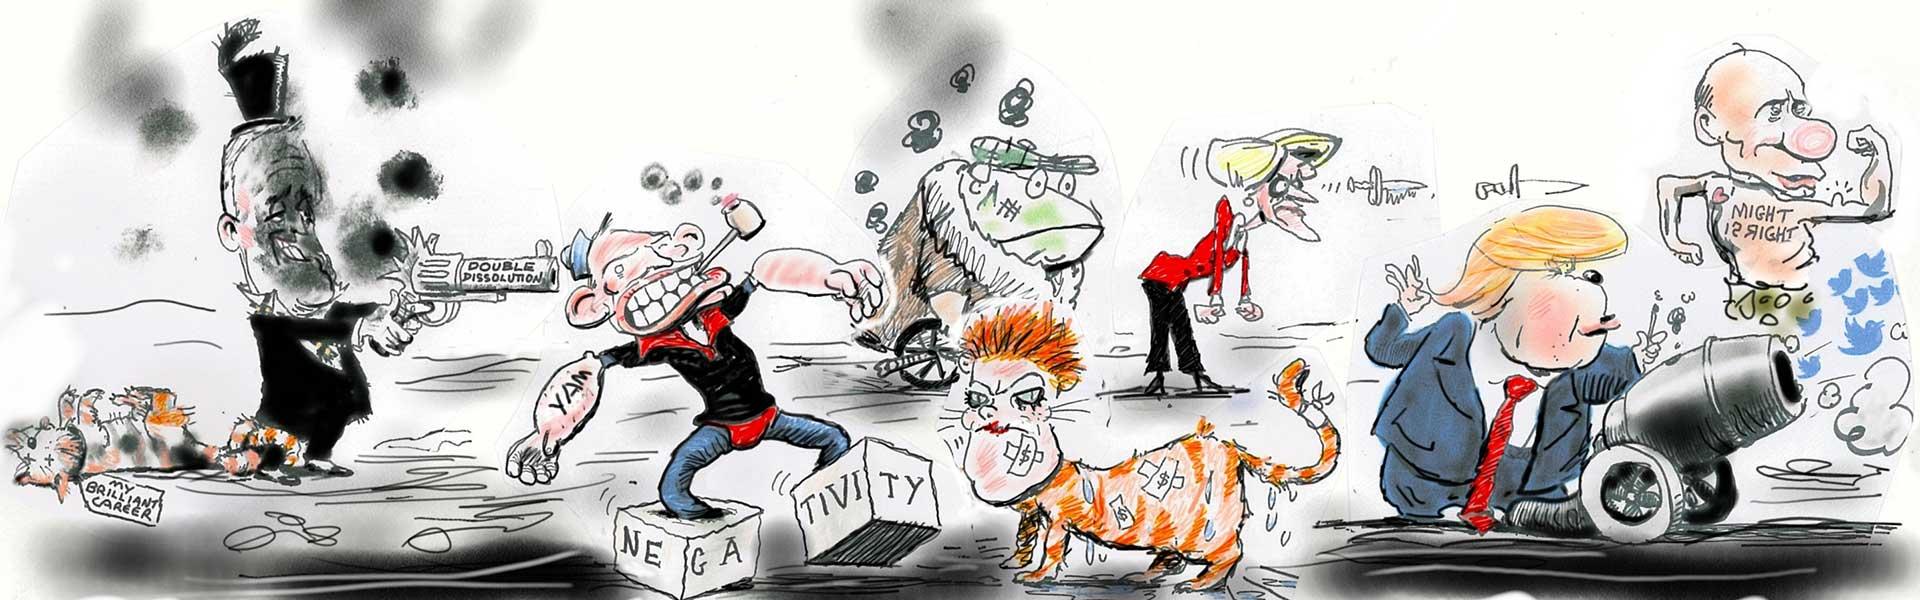 Moir Funny Politcal Cartoons Australia